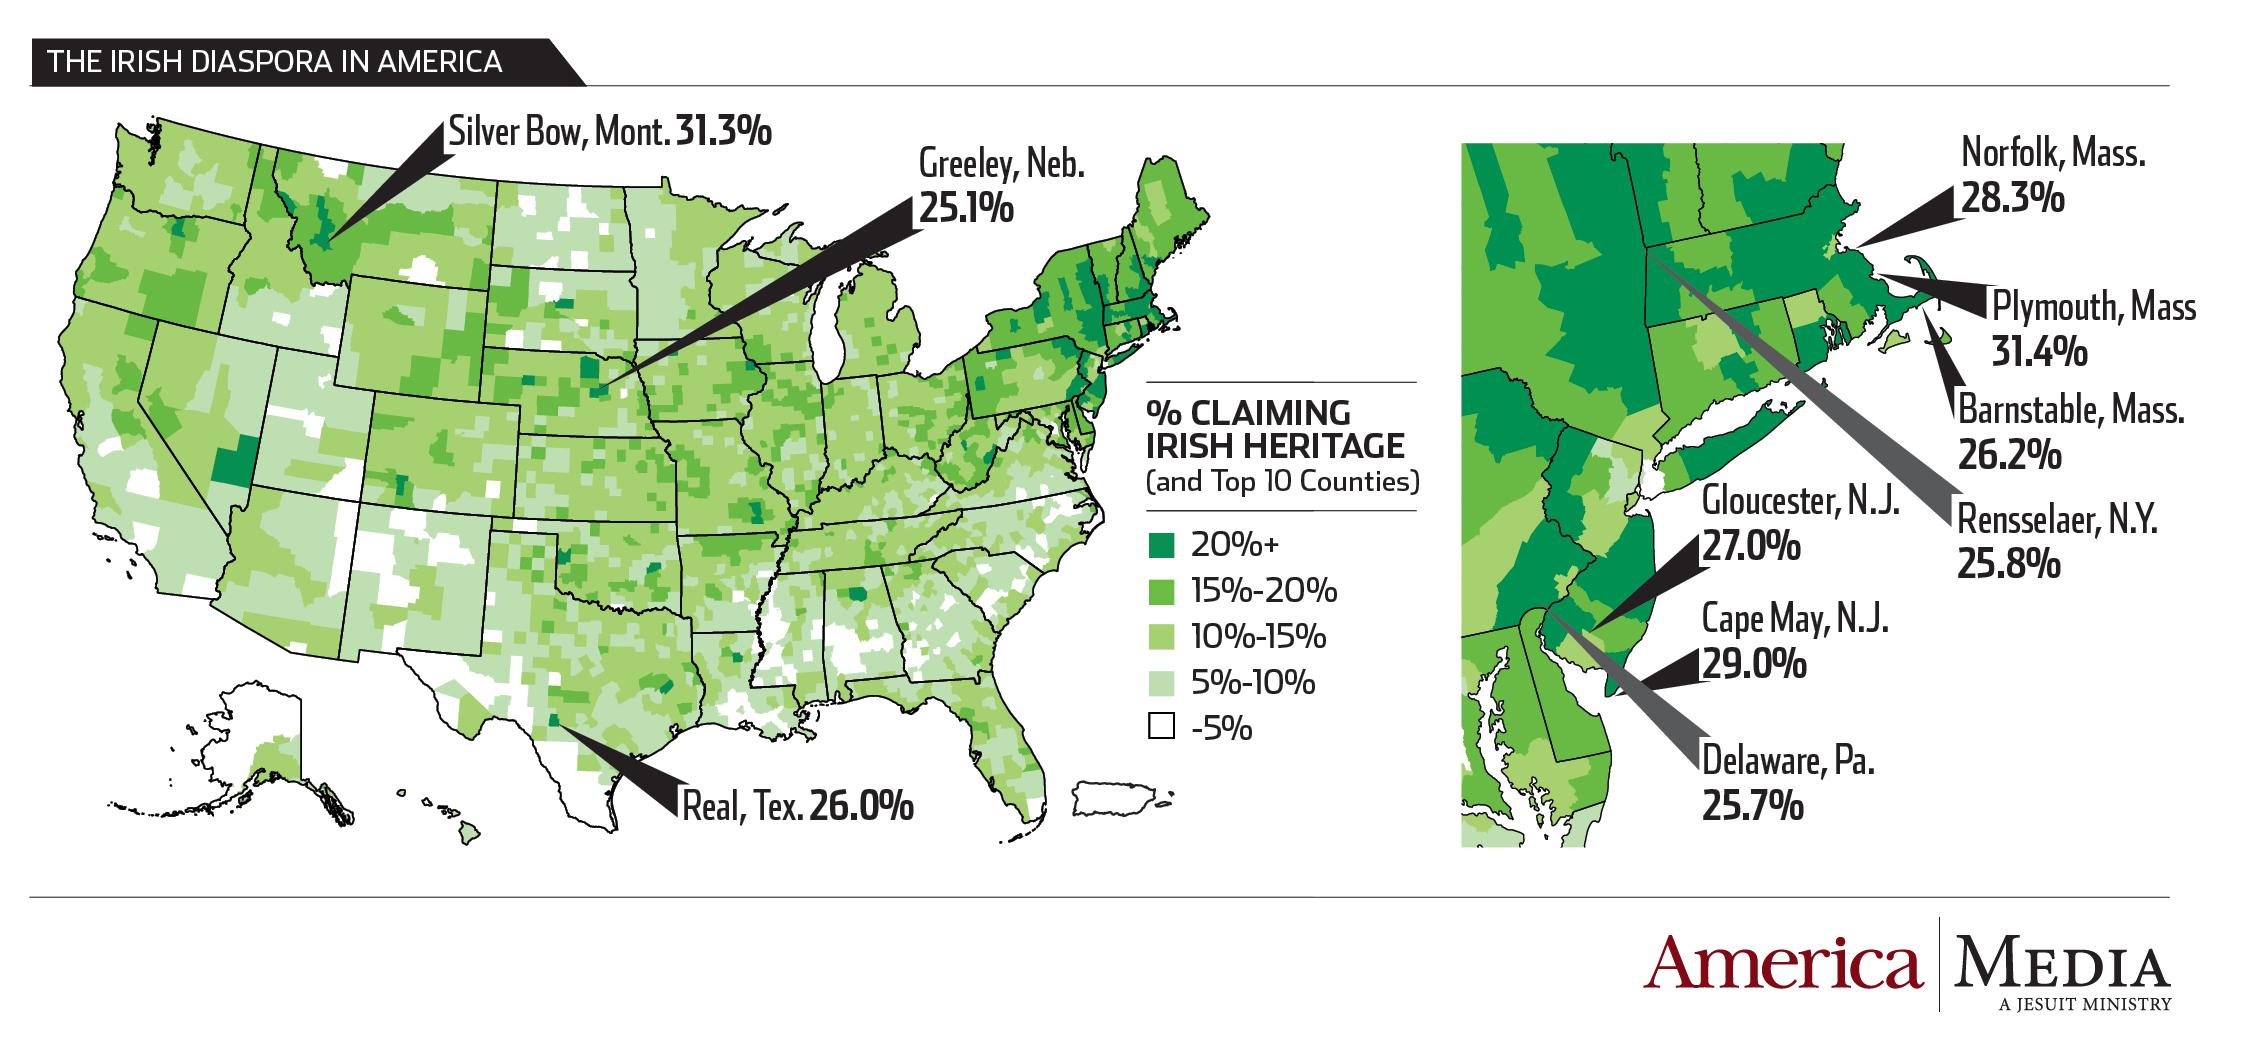 Map Of Ireland Major Cities.Infographic The Irish Diaspora In The United States America Magazine